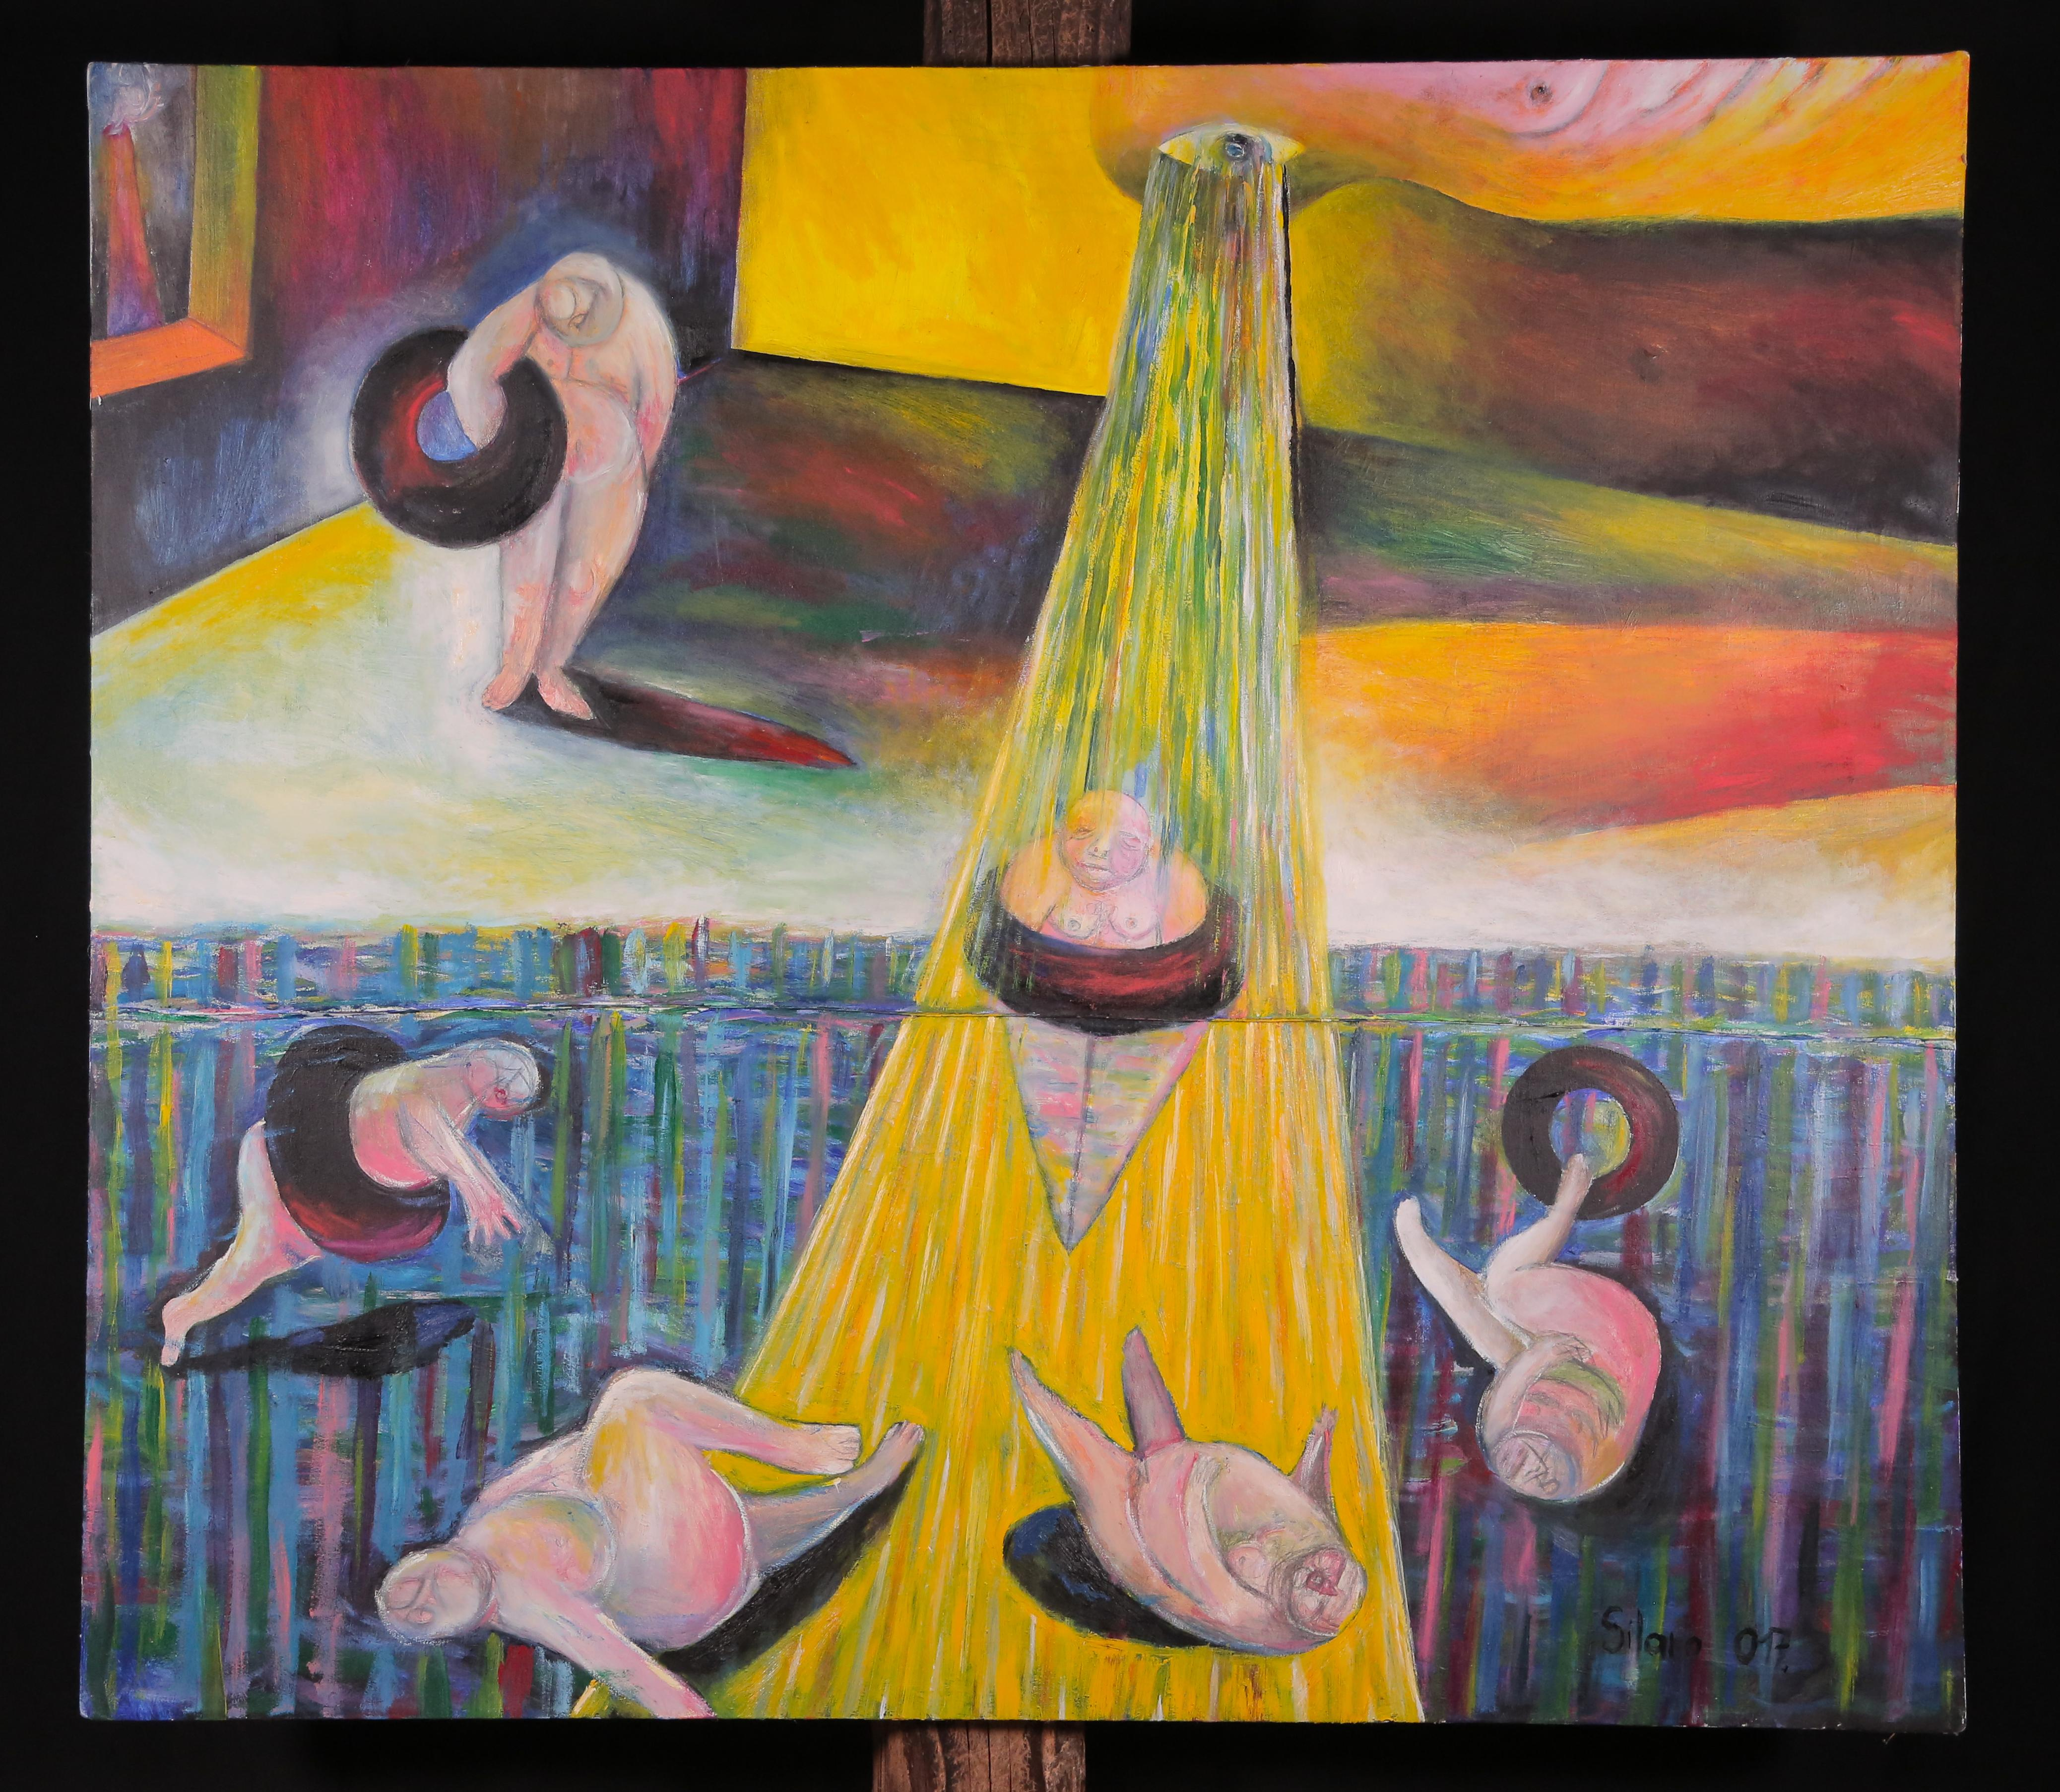 Sadness, Szilard Szilagyi, Abstract Portrait, Oil Painting, Surrealist